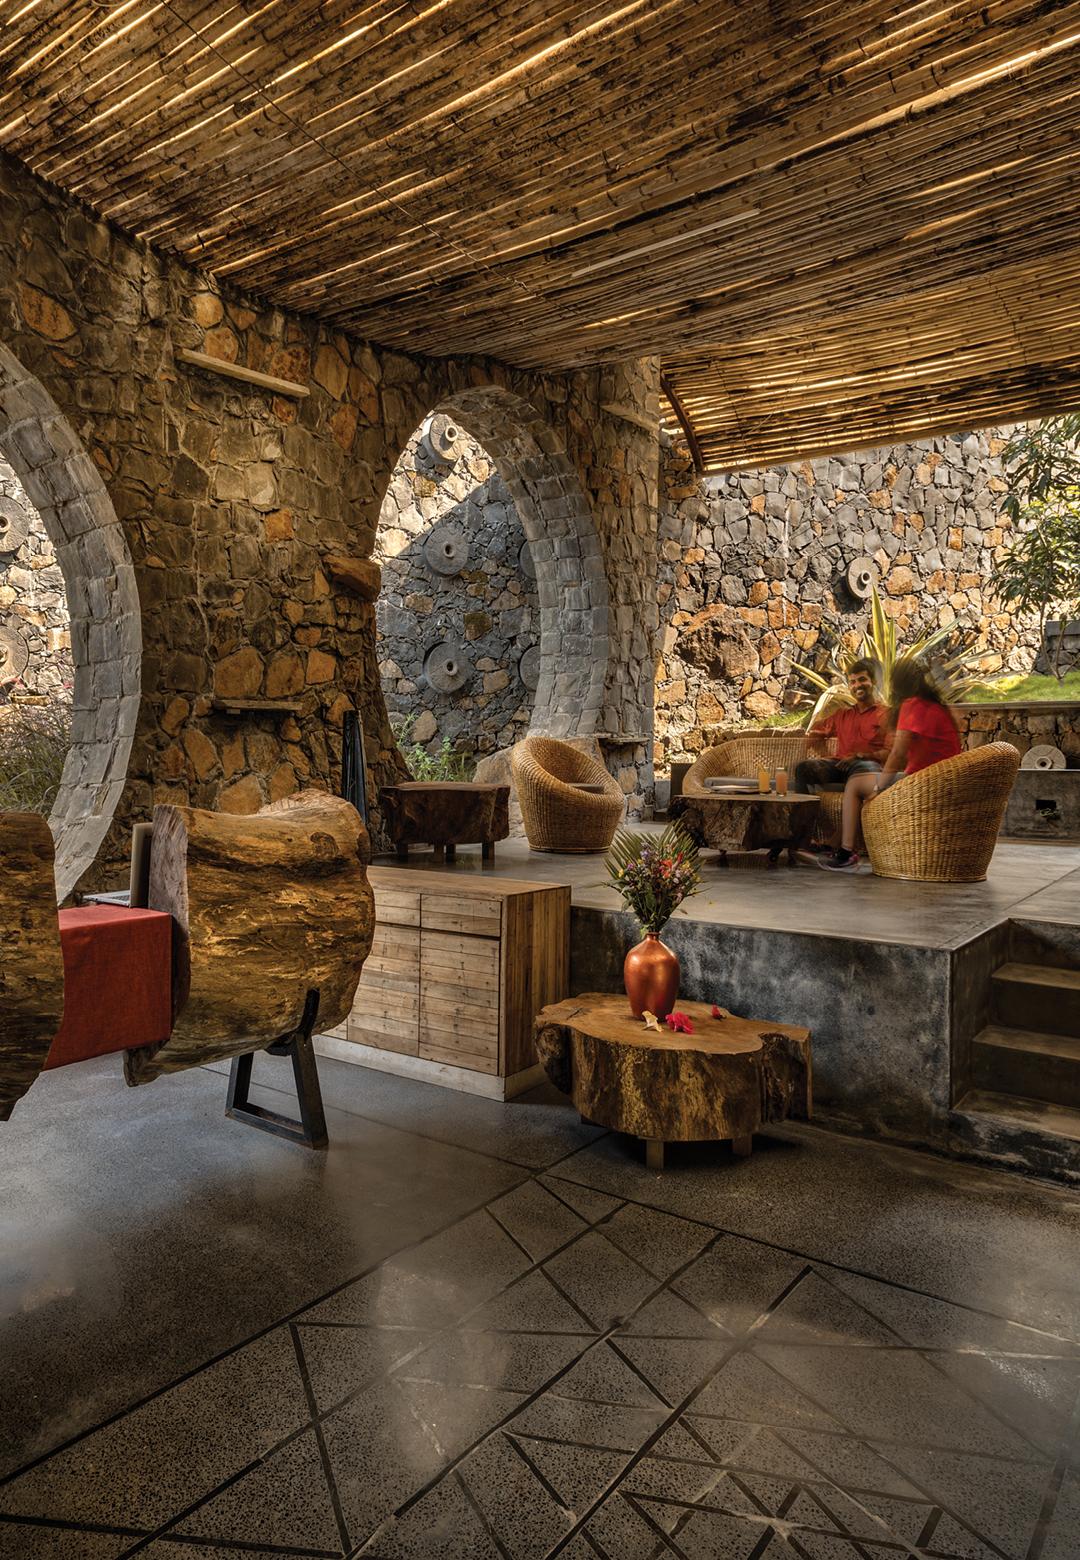 Kondan – The Retreat in Maval, Pune (India) by PMA madhushala | Kondan Resort | PMA madhushala | STIRworld